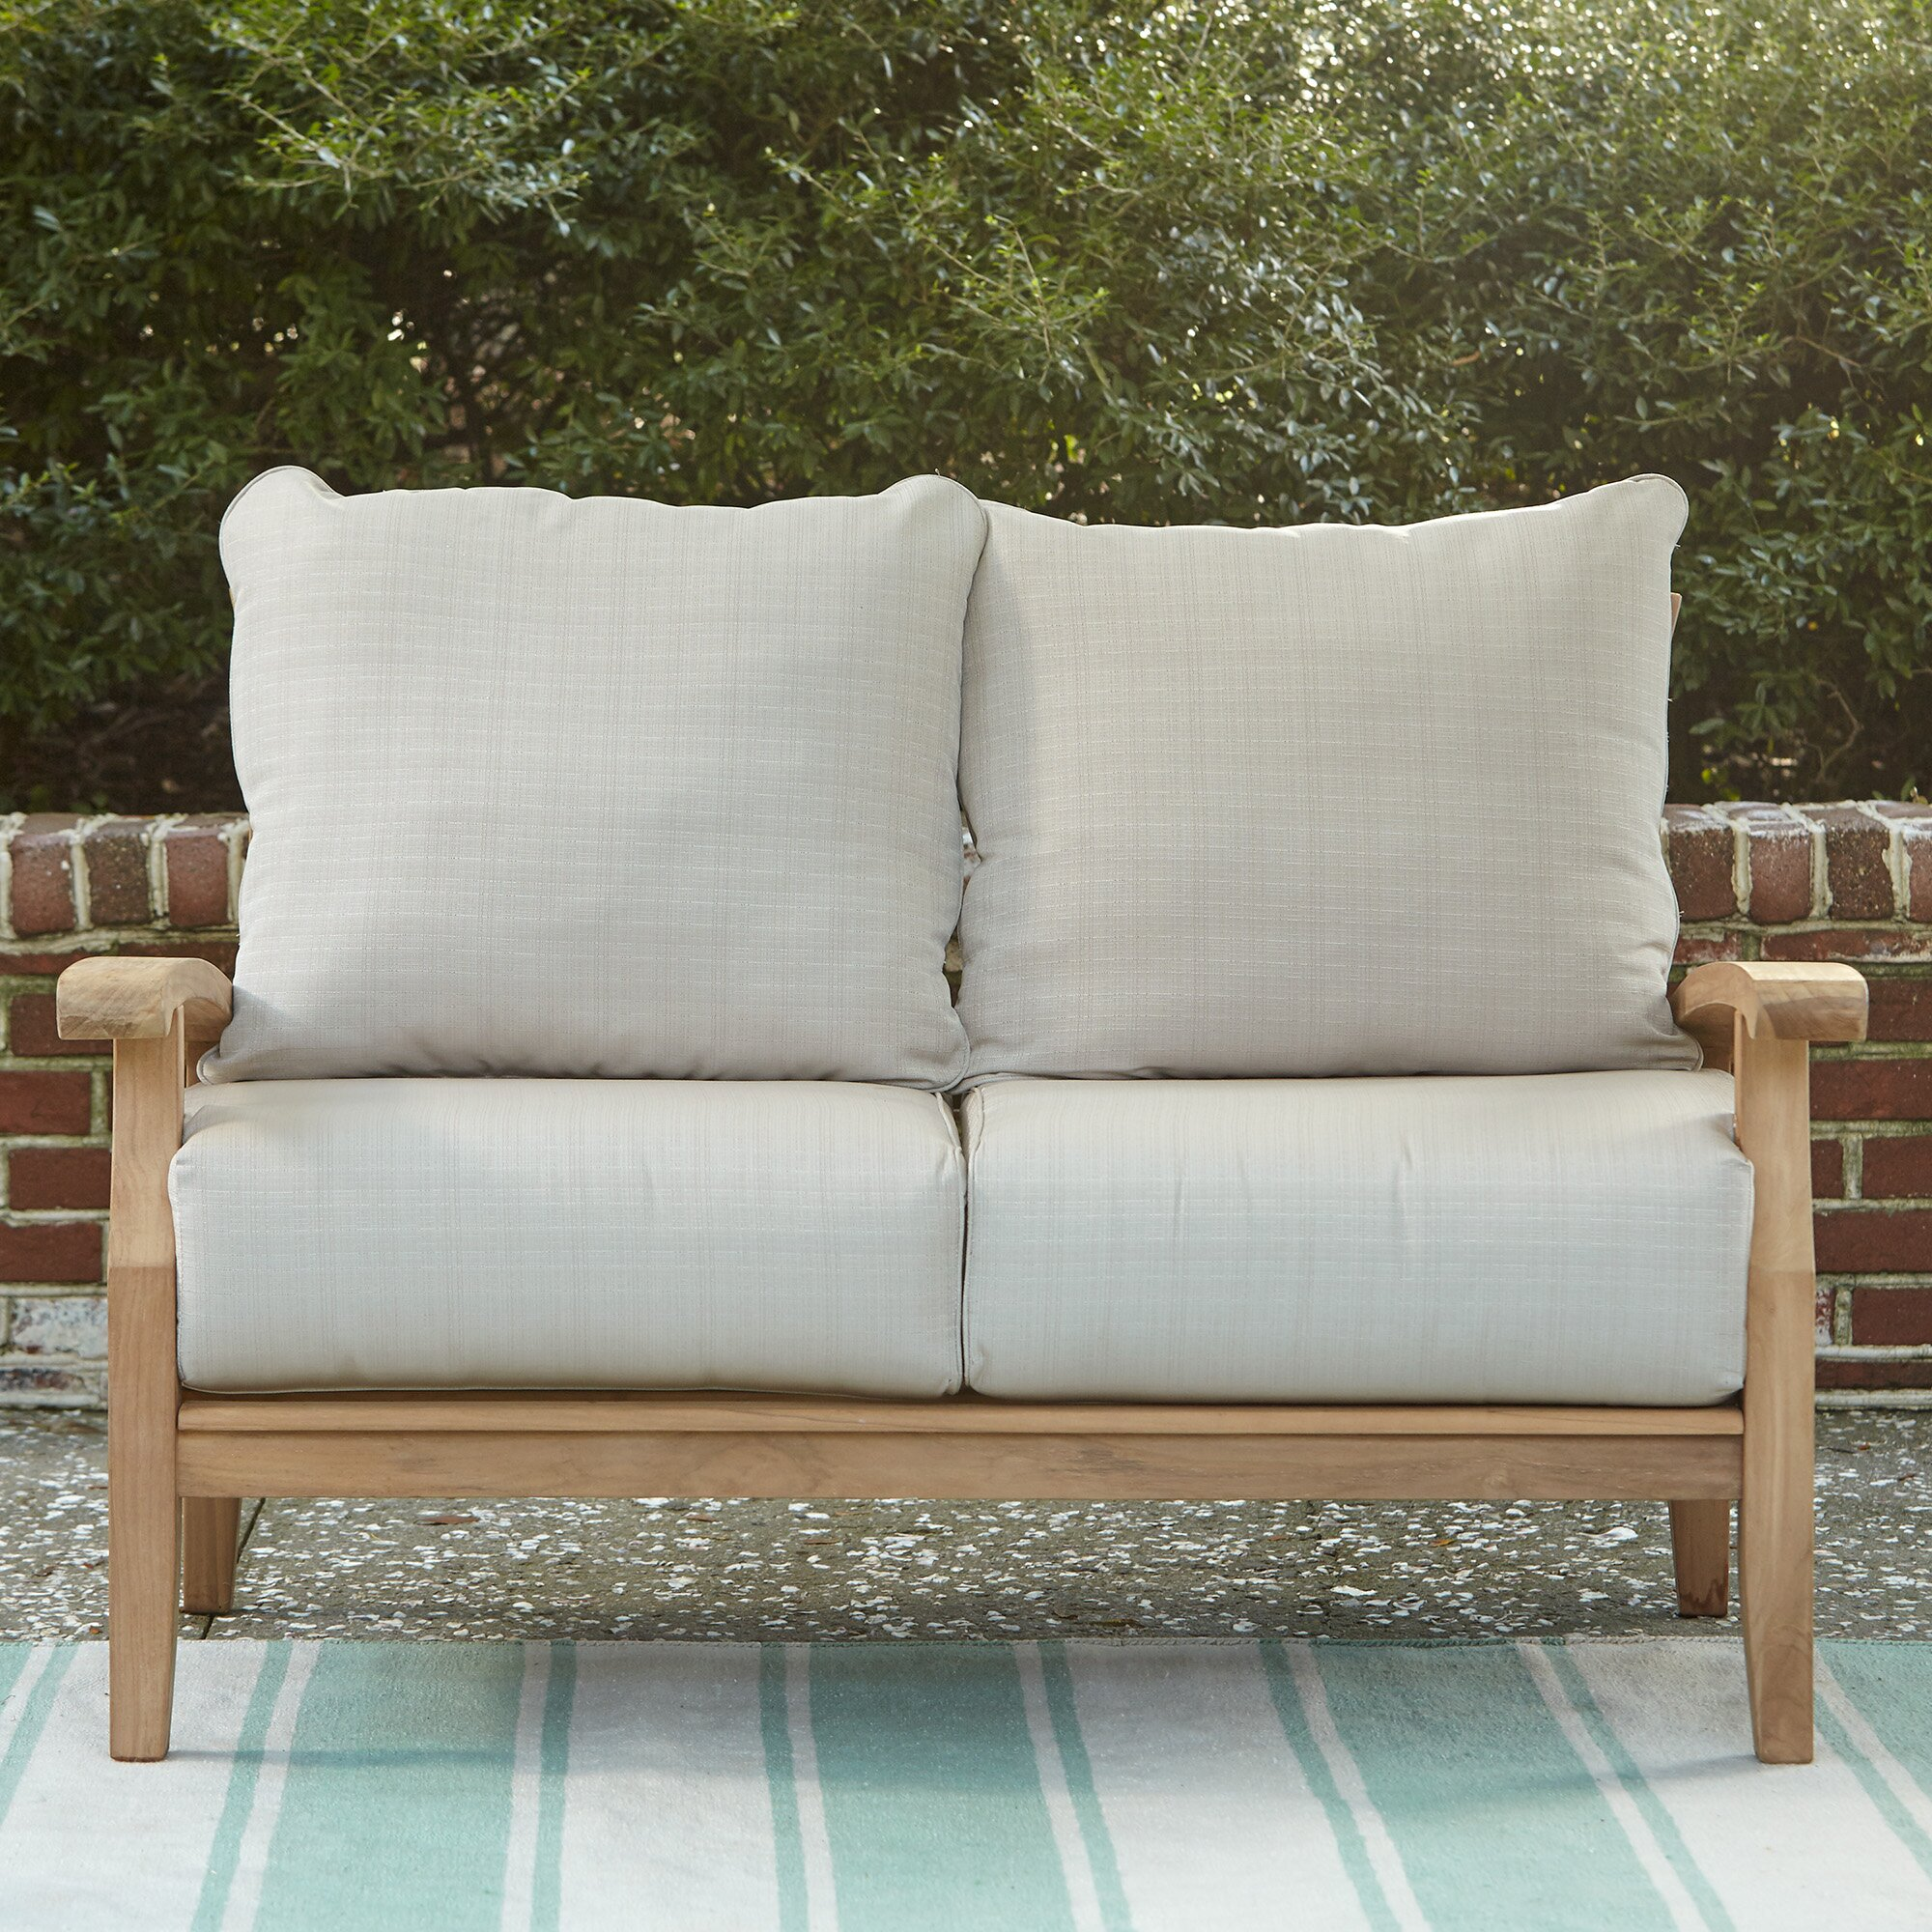 Birch Lane Summerton Teak Loveseat With Cushions Reviews Wayfair